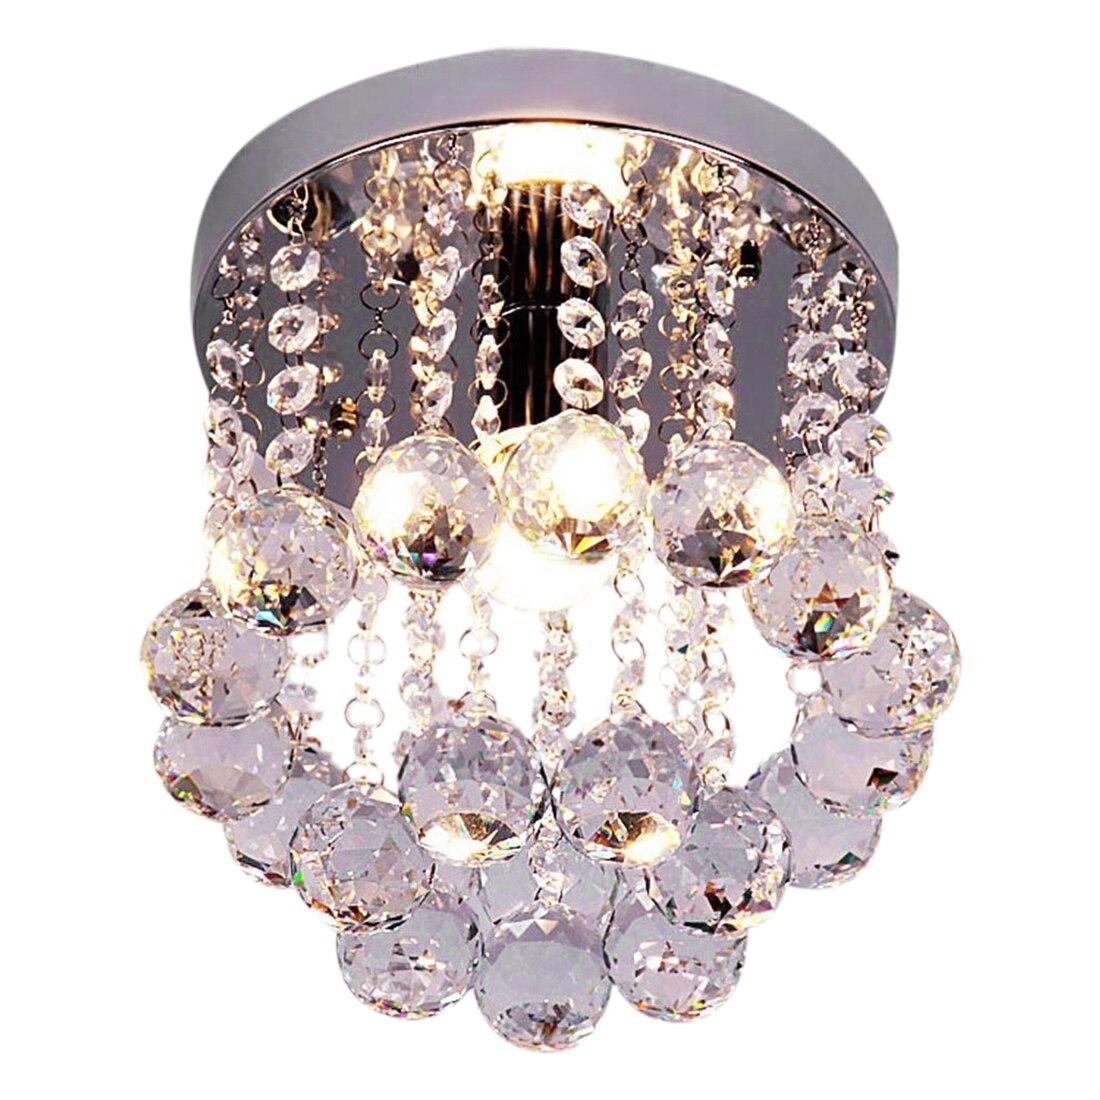 CSS Retro Luxury Flush Mount Crystal  Ceiling Light Chandelier Lighting HQ как купить ракуты в css